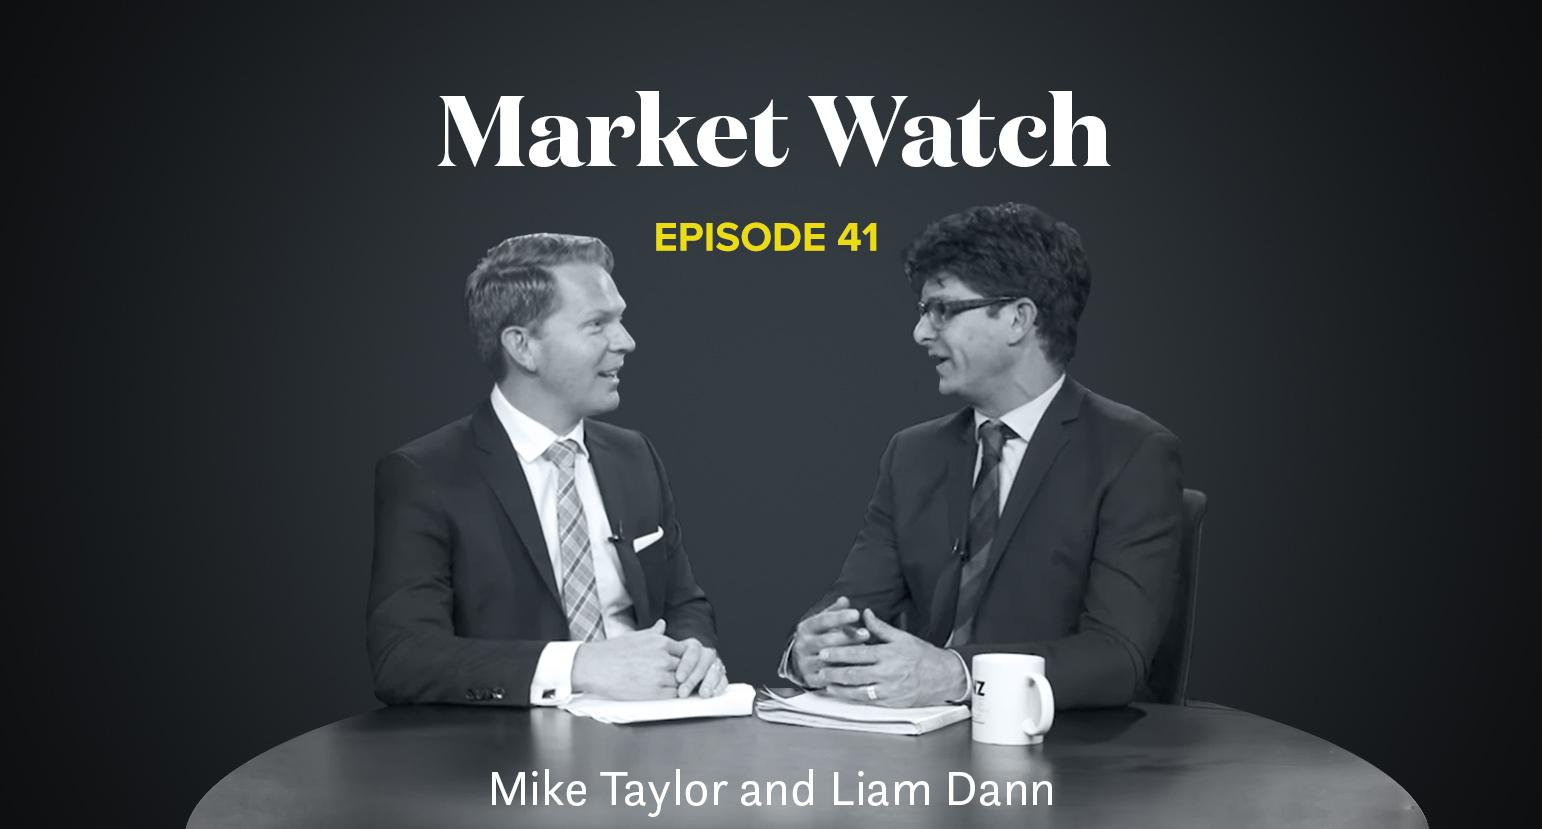 Market-Watch-Video-and-EP41_Digital.jpg